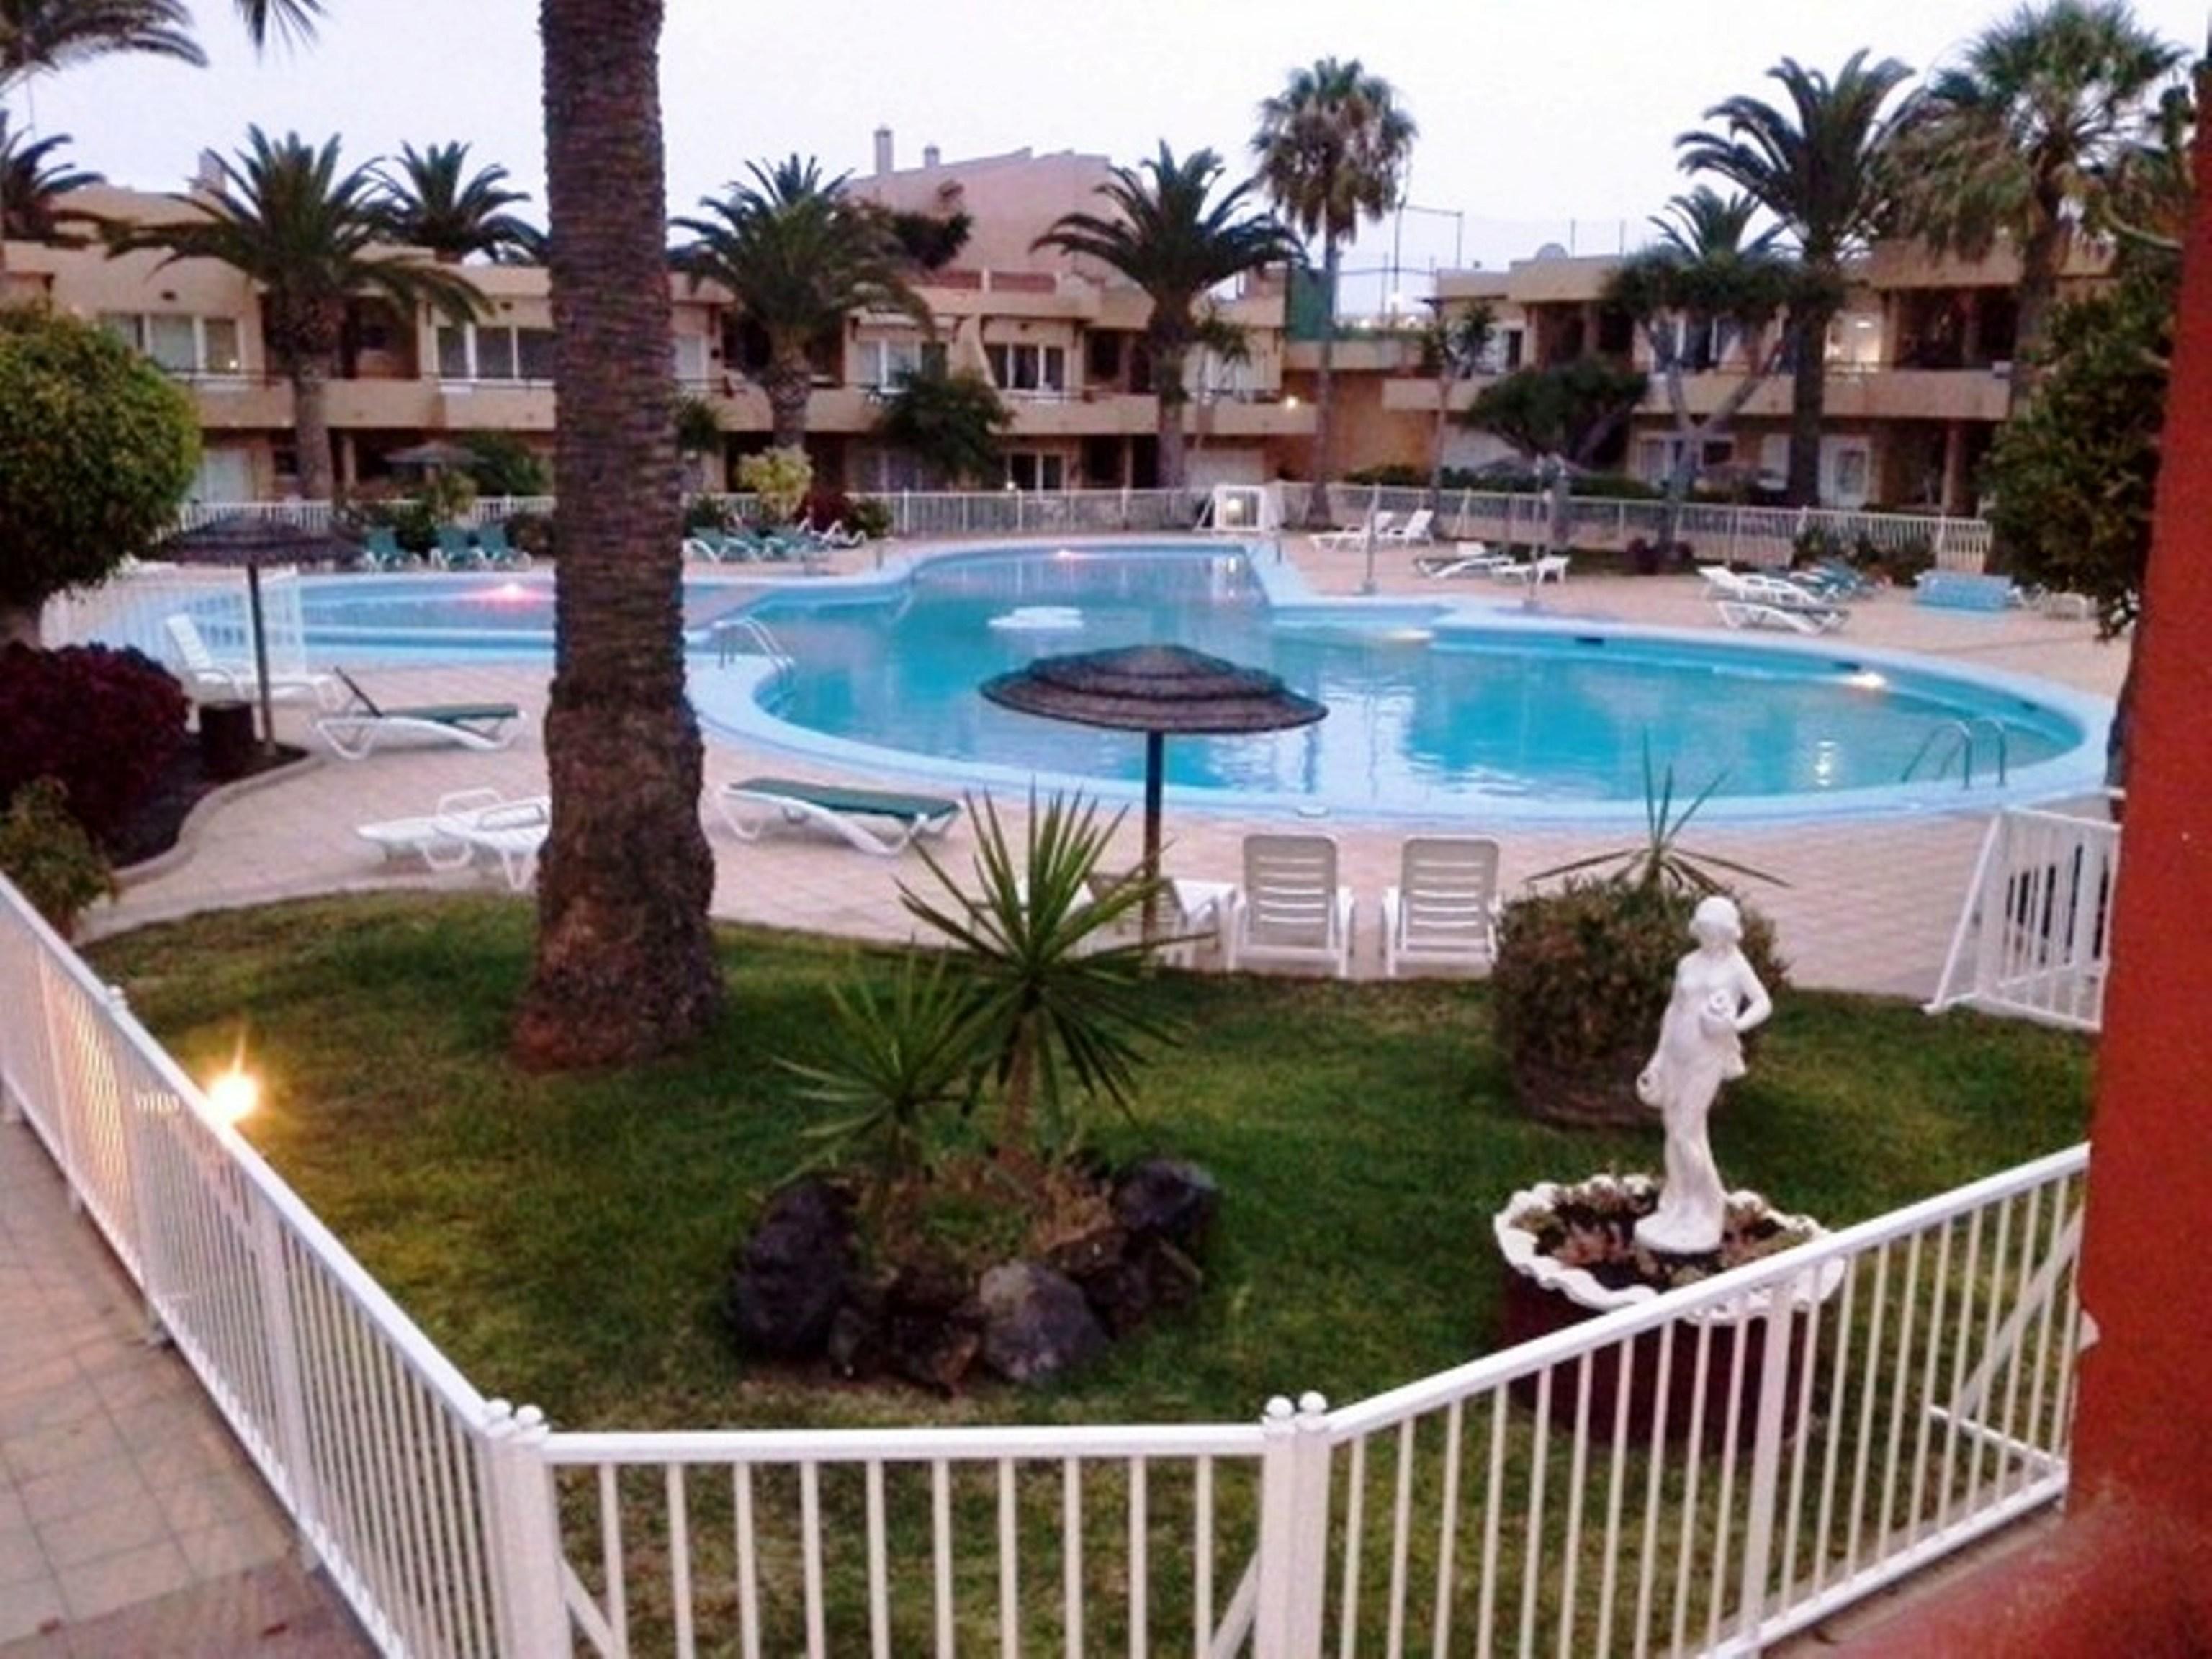 Ferienwohnung Wohnung El Mirador -Residencial Las Dunas - (2196686), Corralejo, Fuerteventura, Kanarische Inseln, Spanien, Bild 12